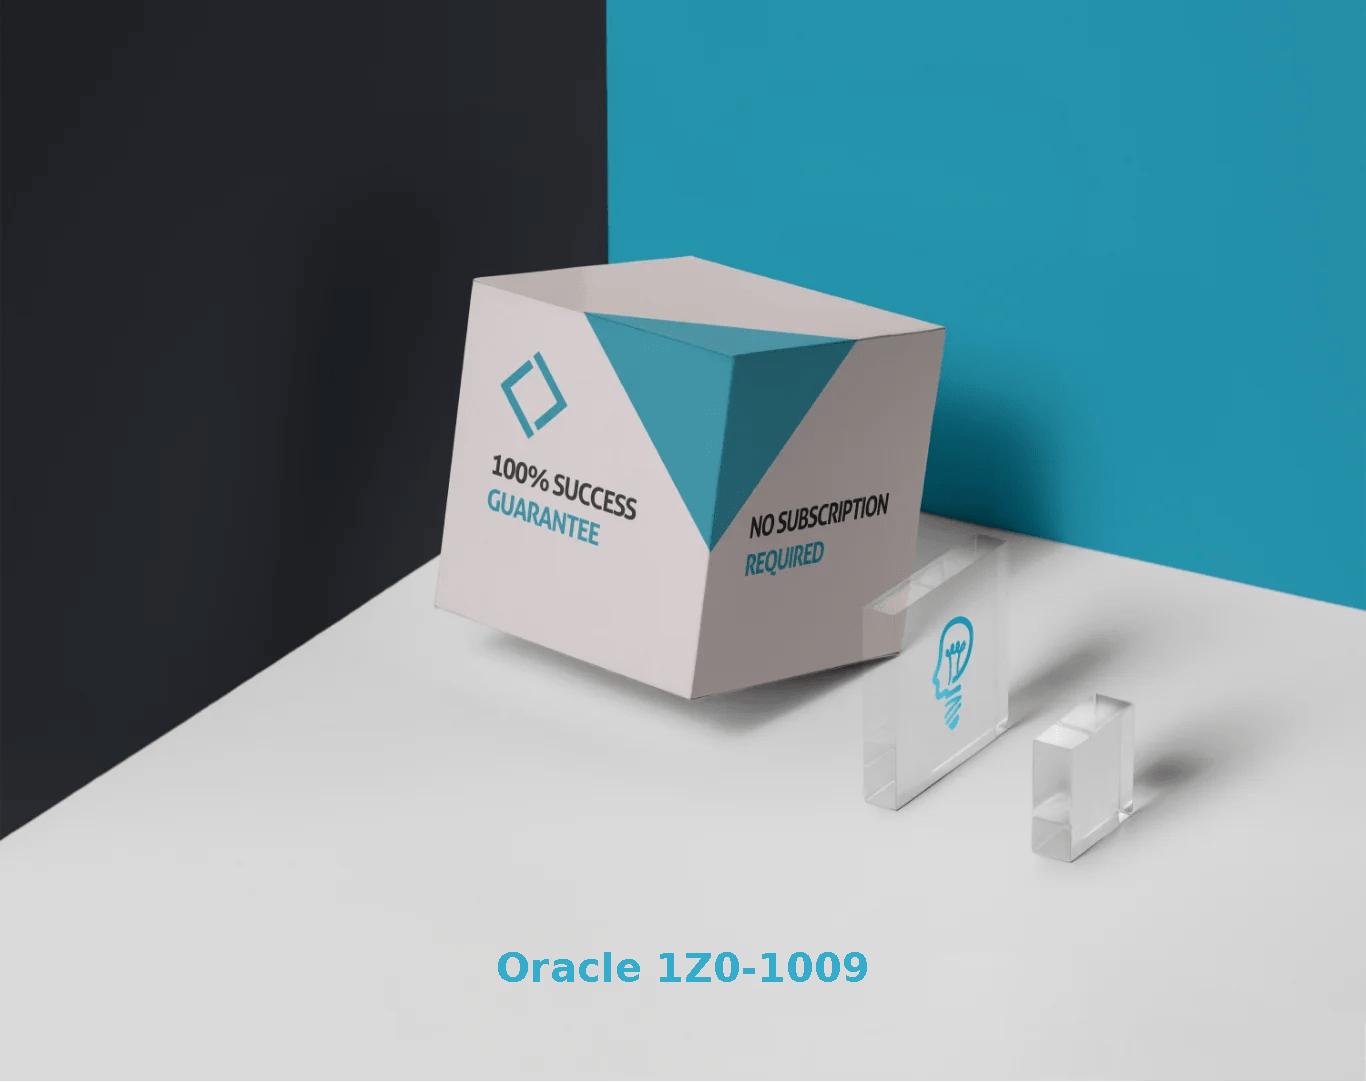 Oracle 1Z0-1009 Exams